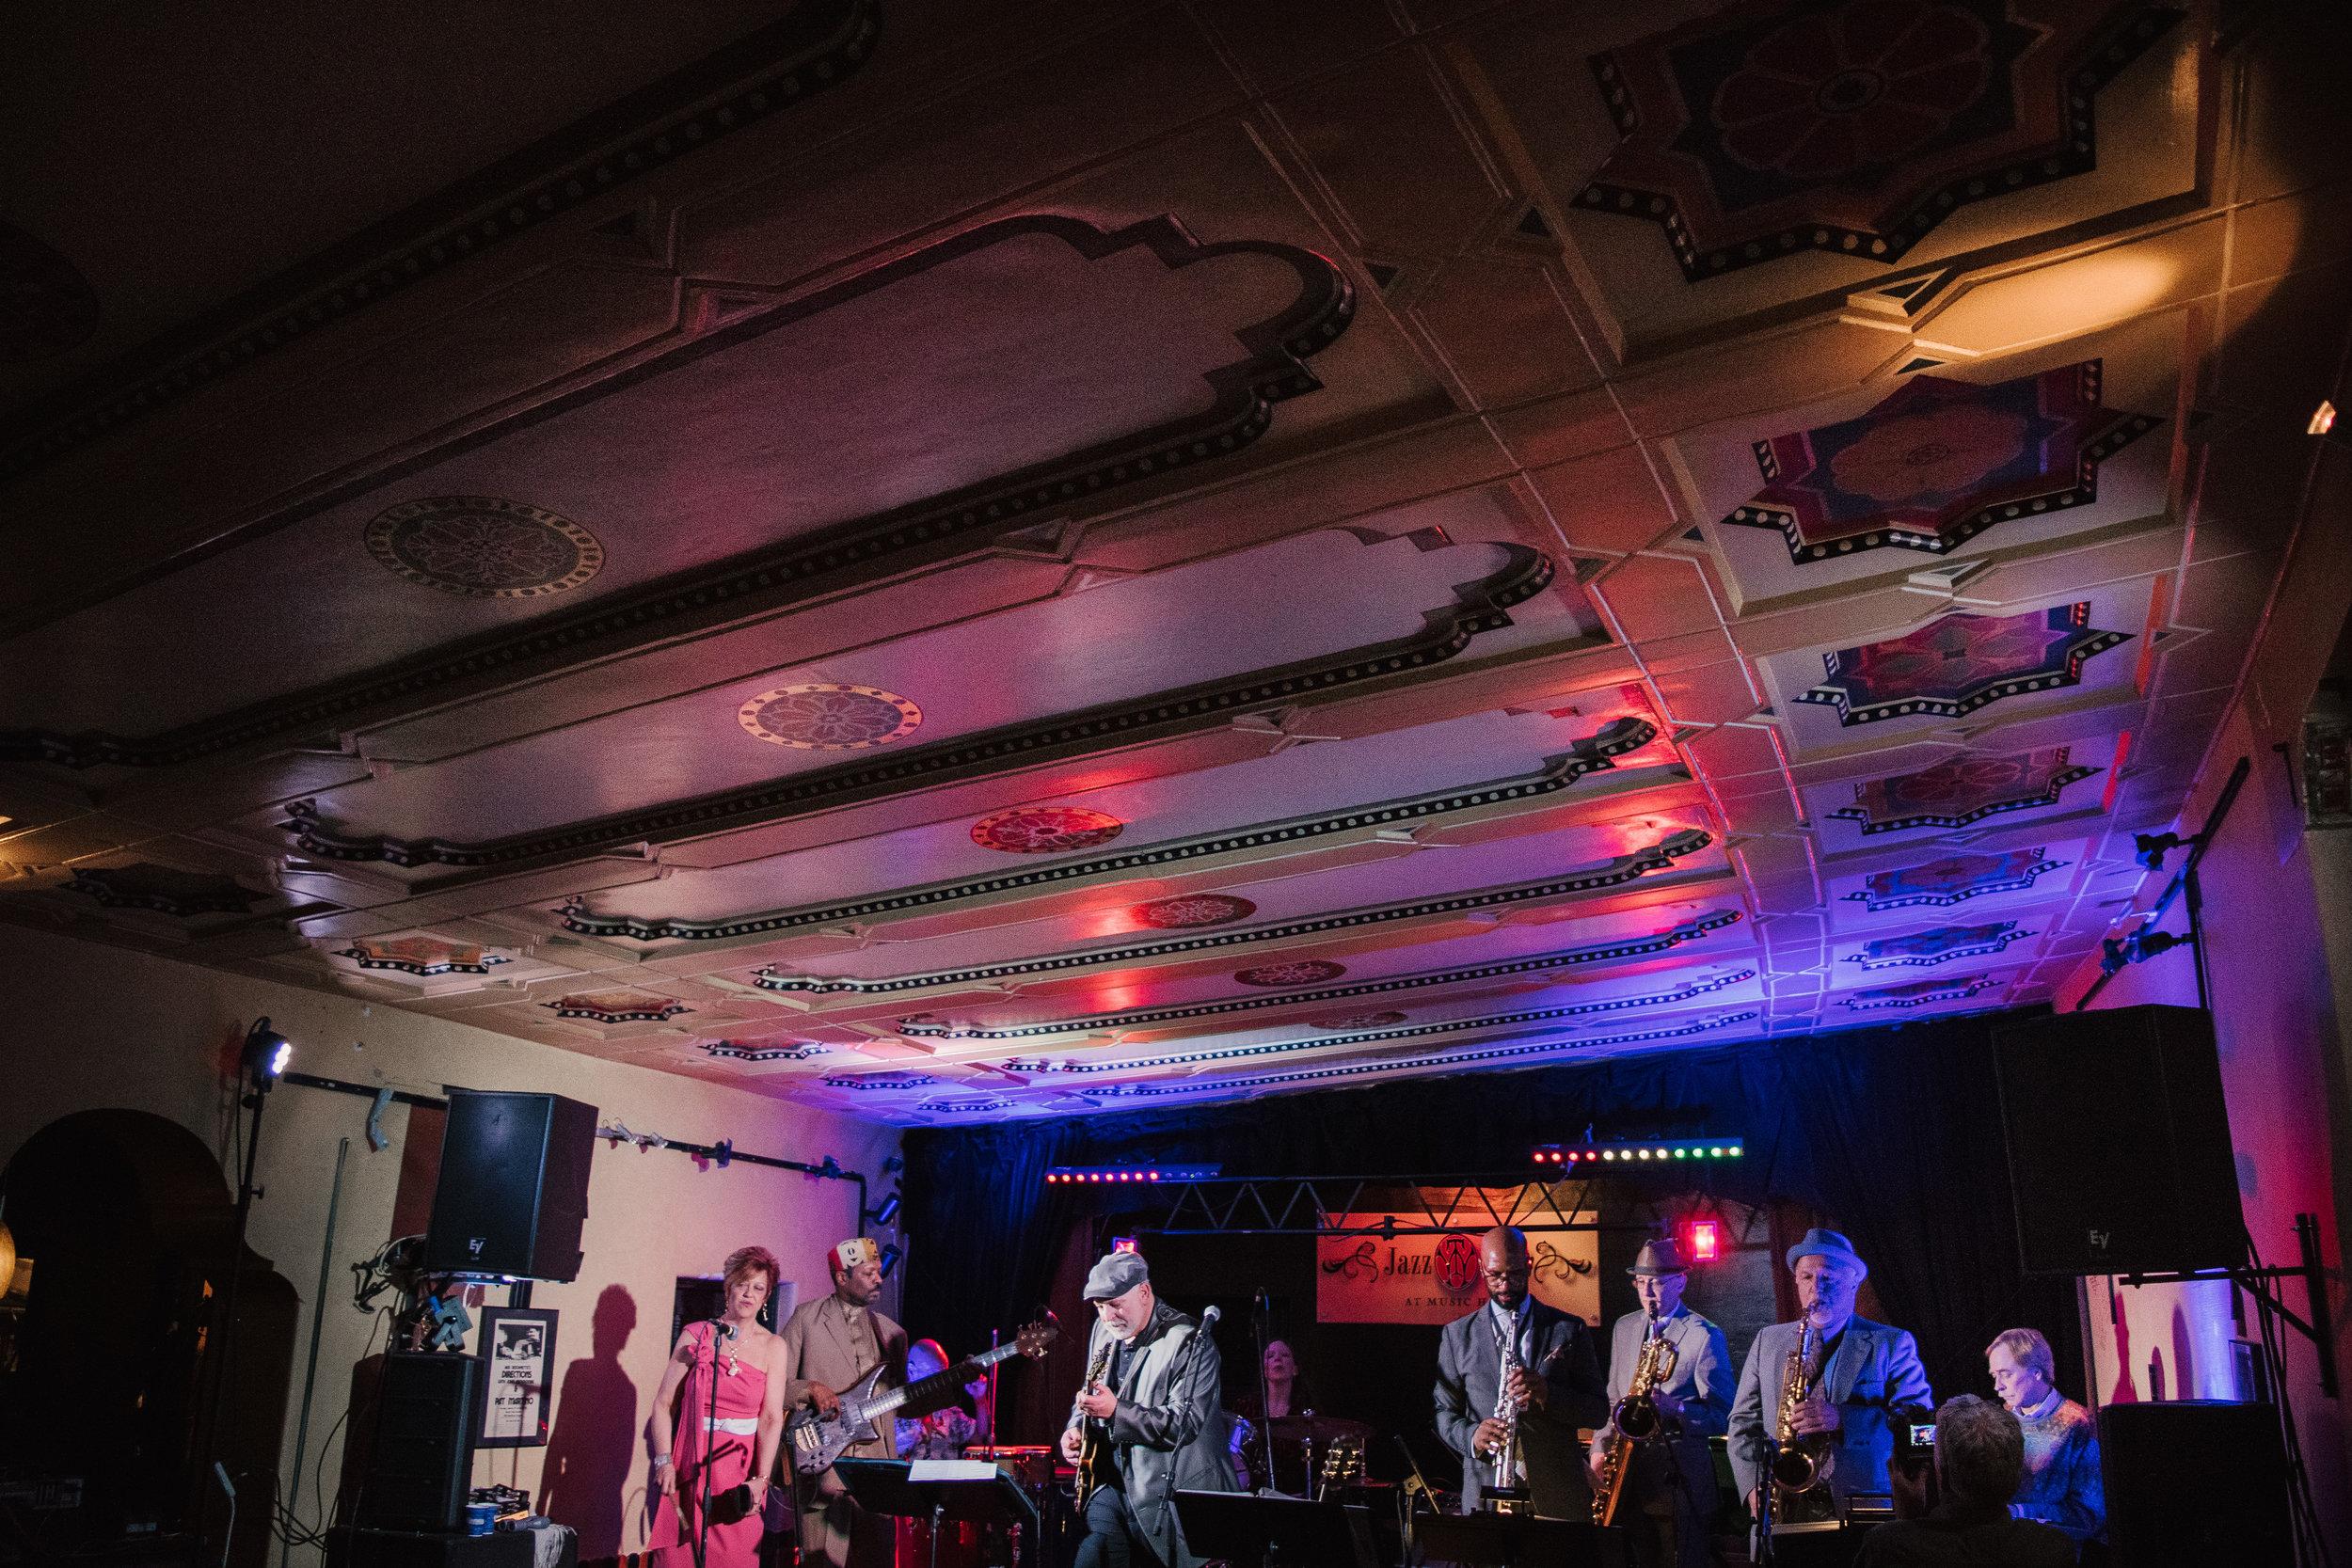 Gene-n-Tonics March 23 Jazz Cafe-20170323-09-01-05.JPG